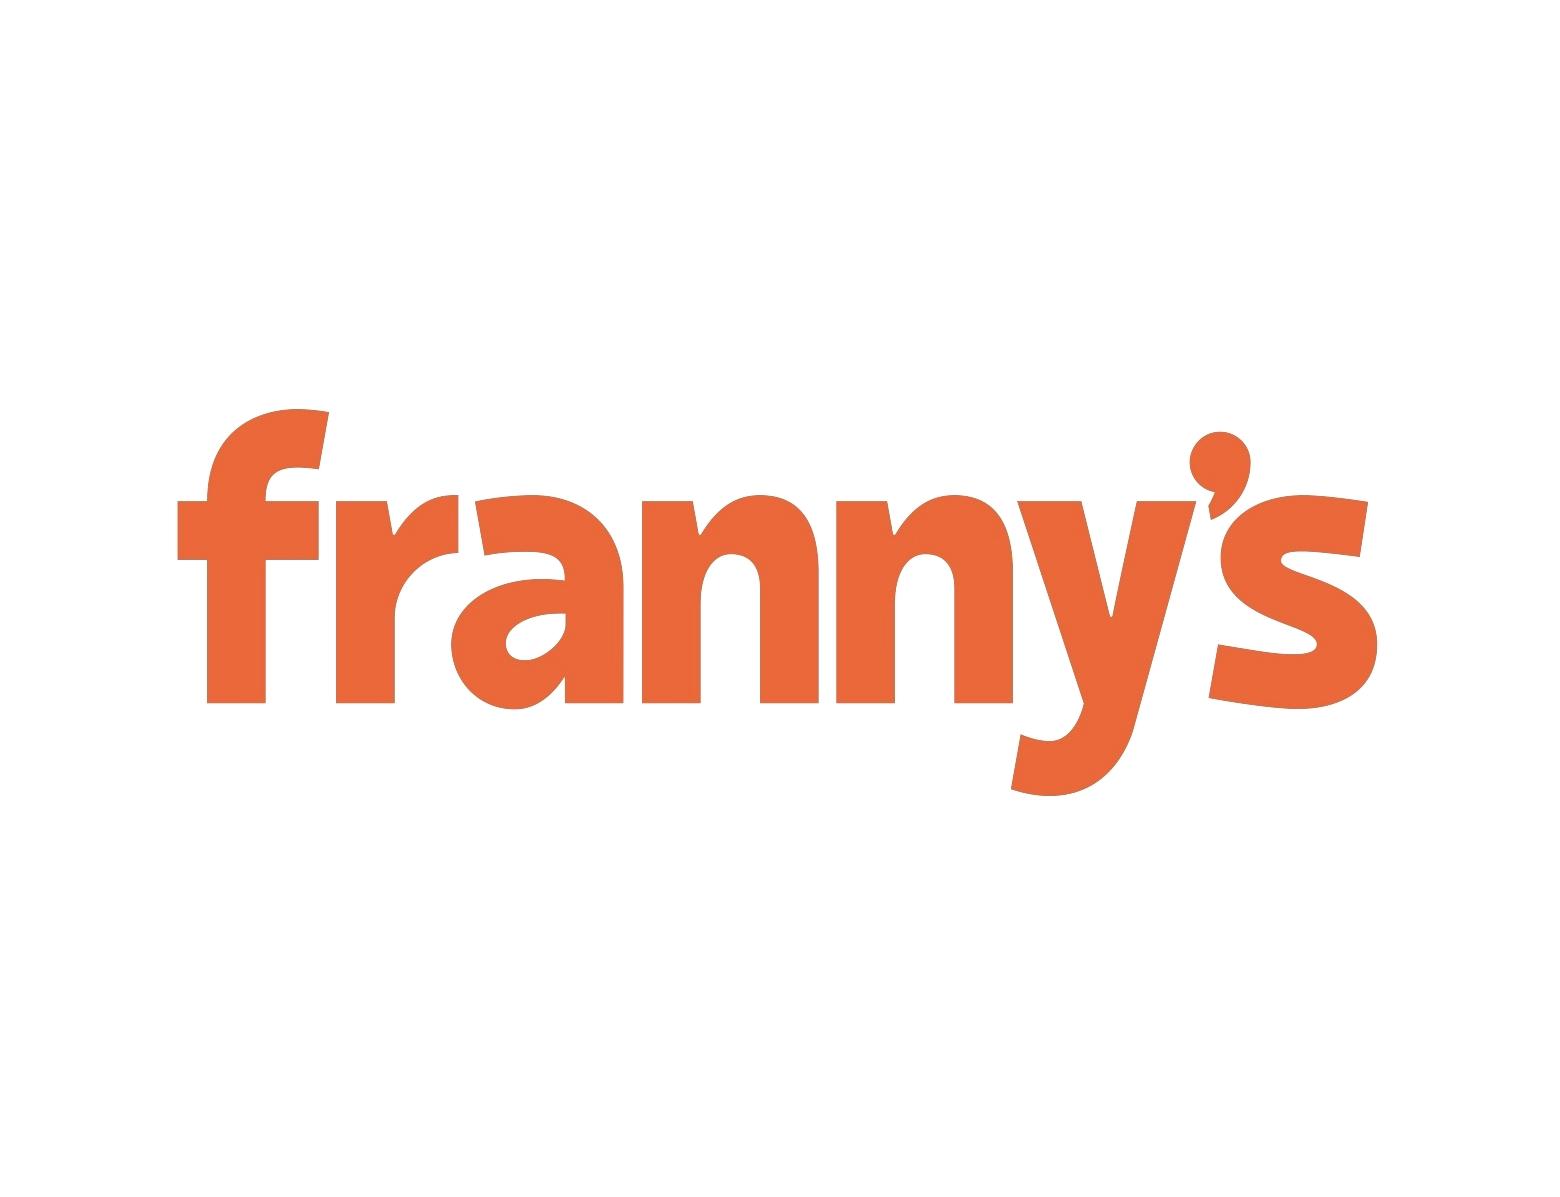 franny's logo.jpg